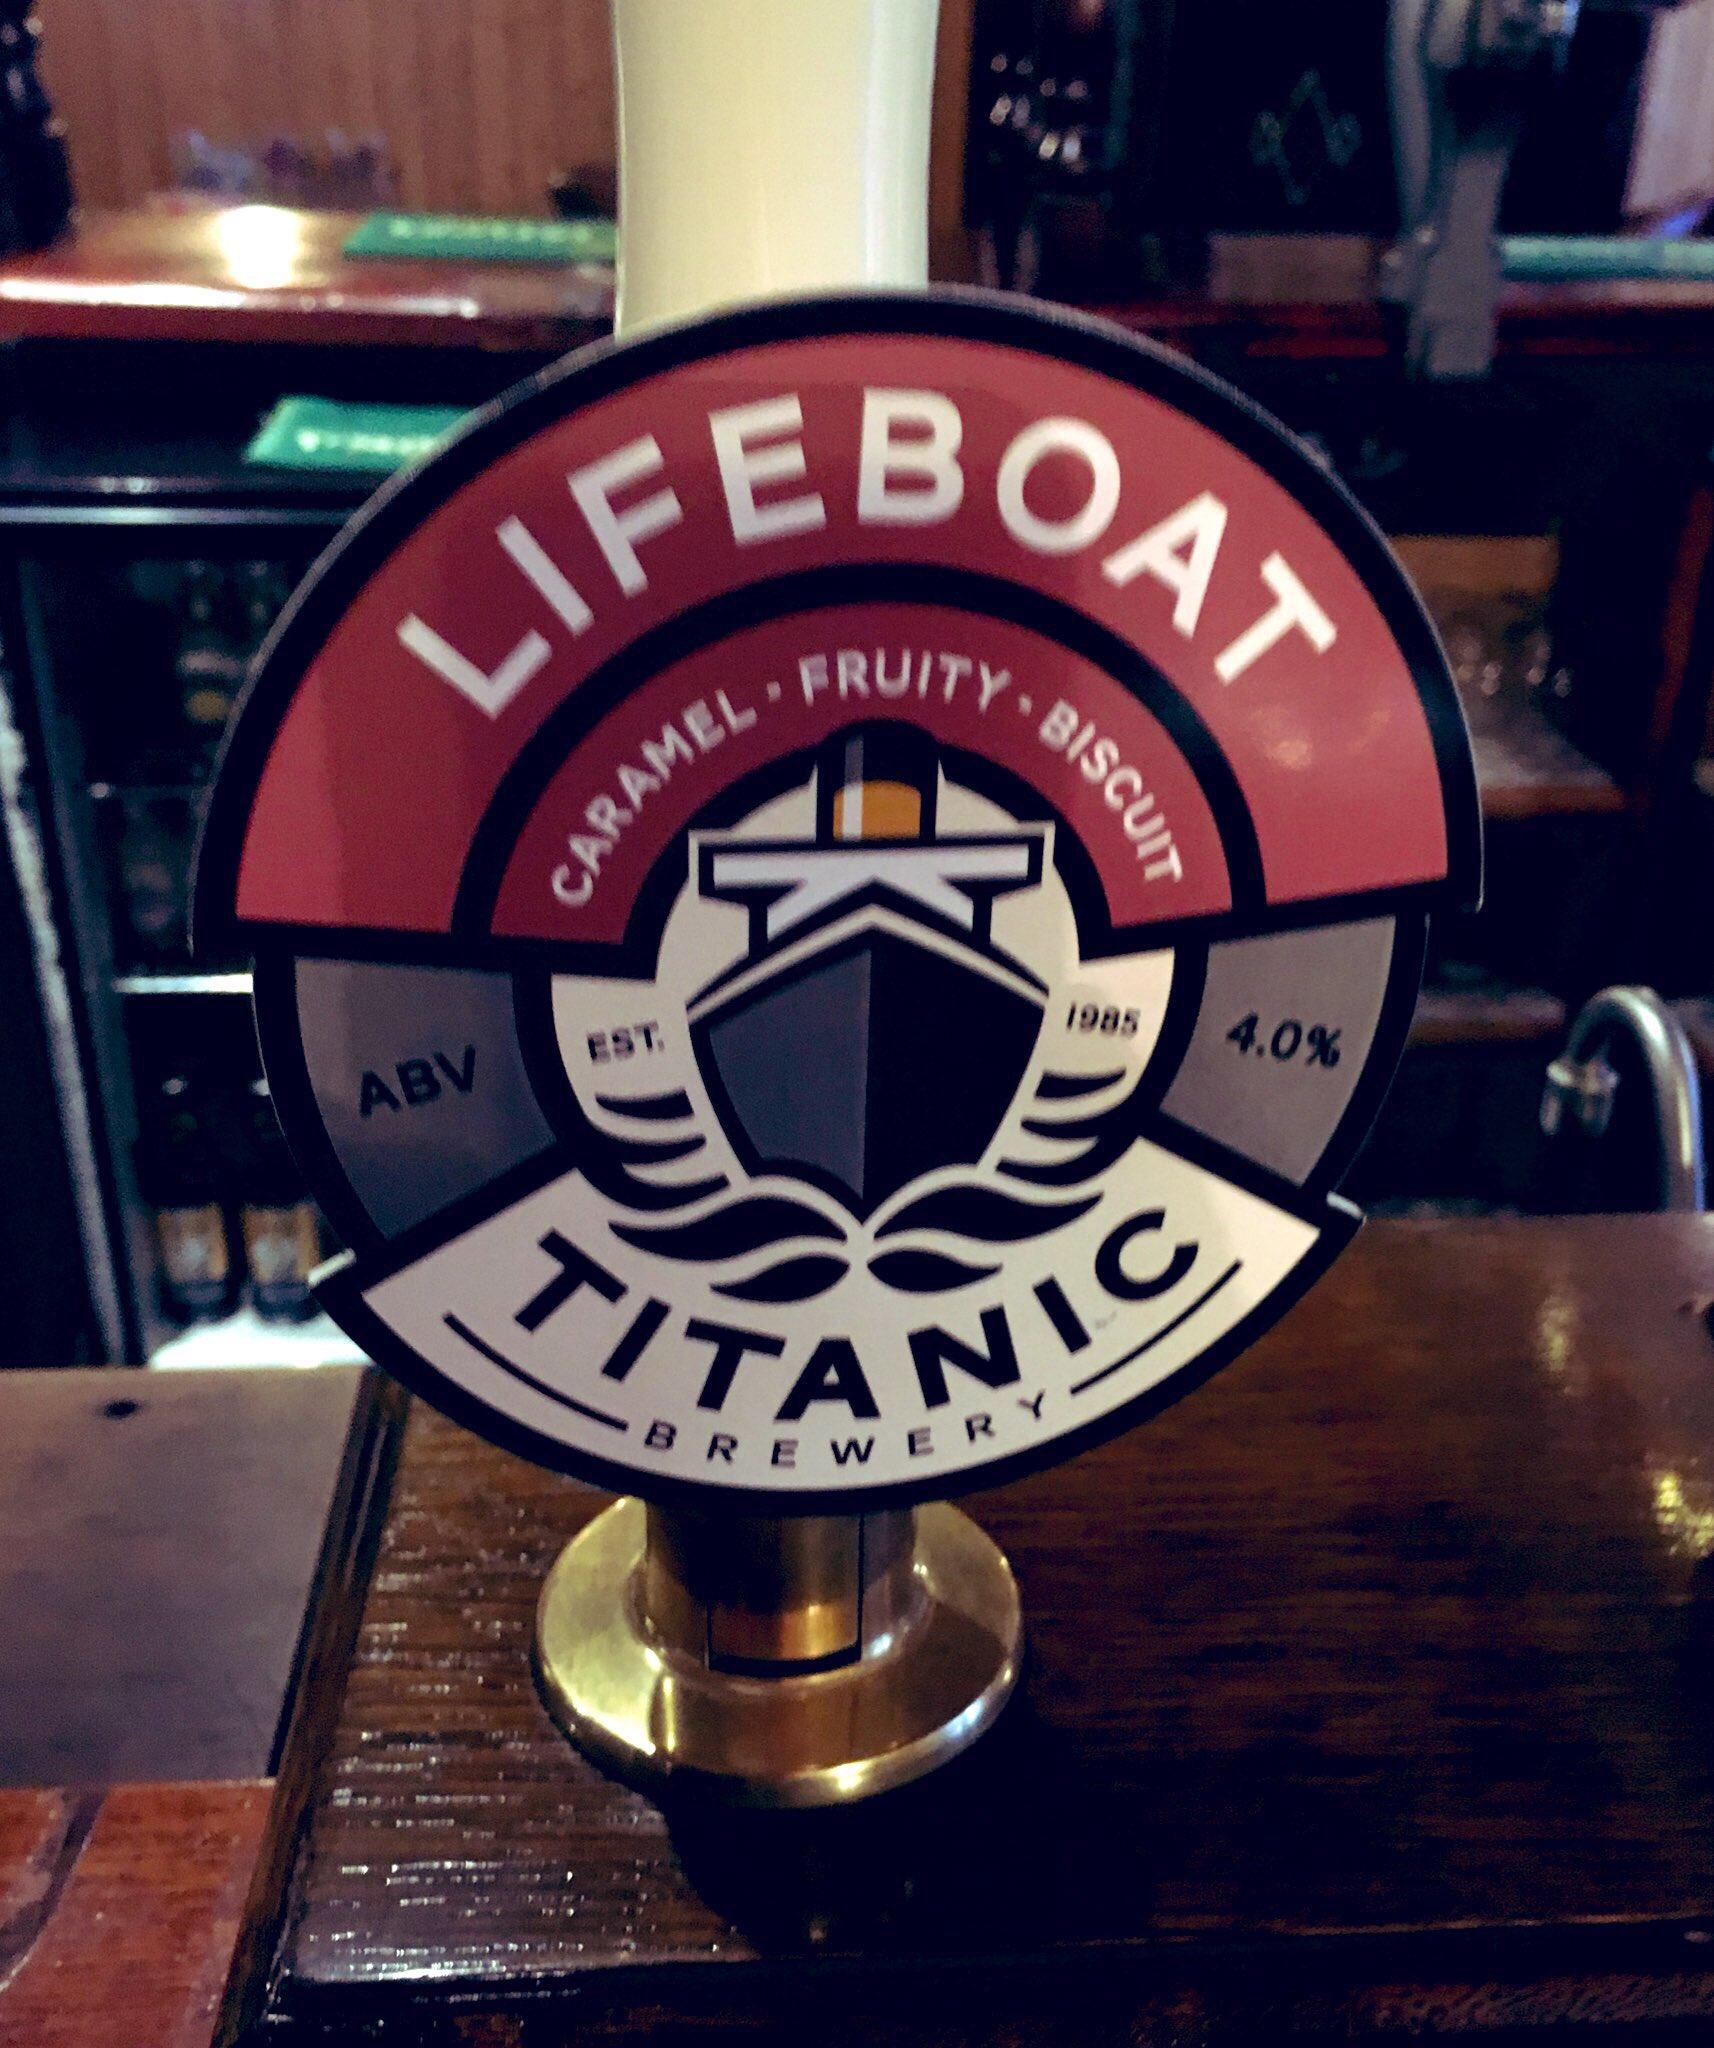 205: Lifeboat